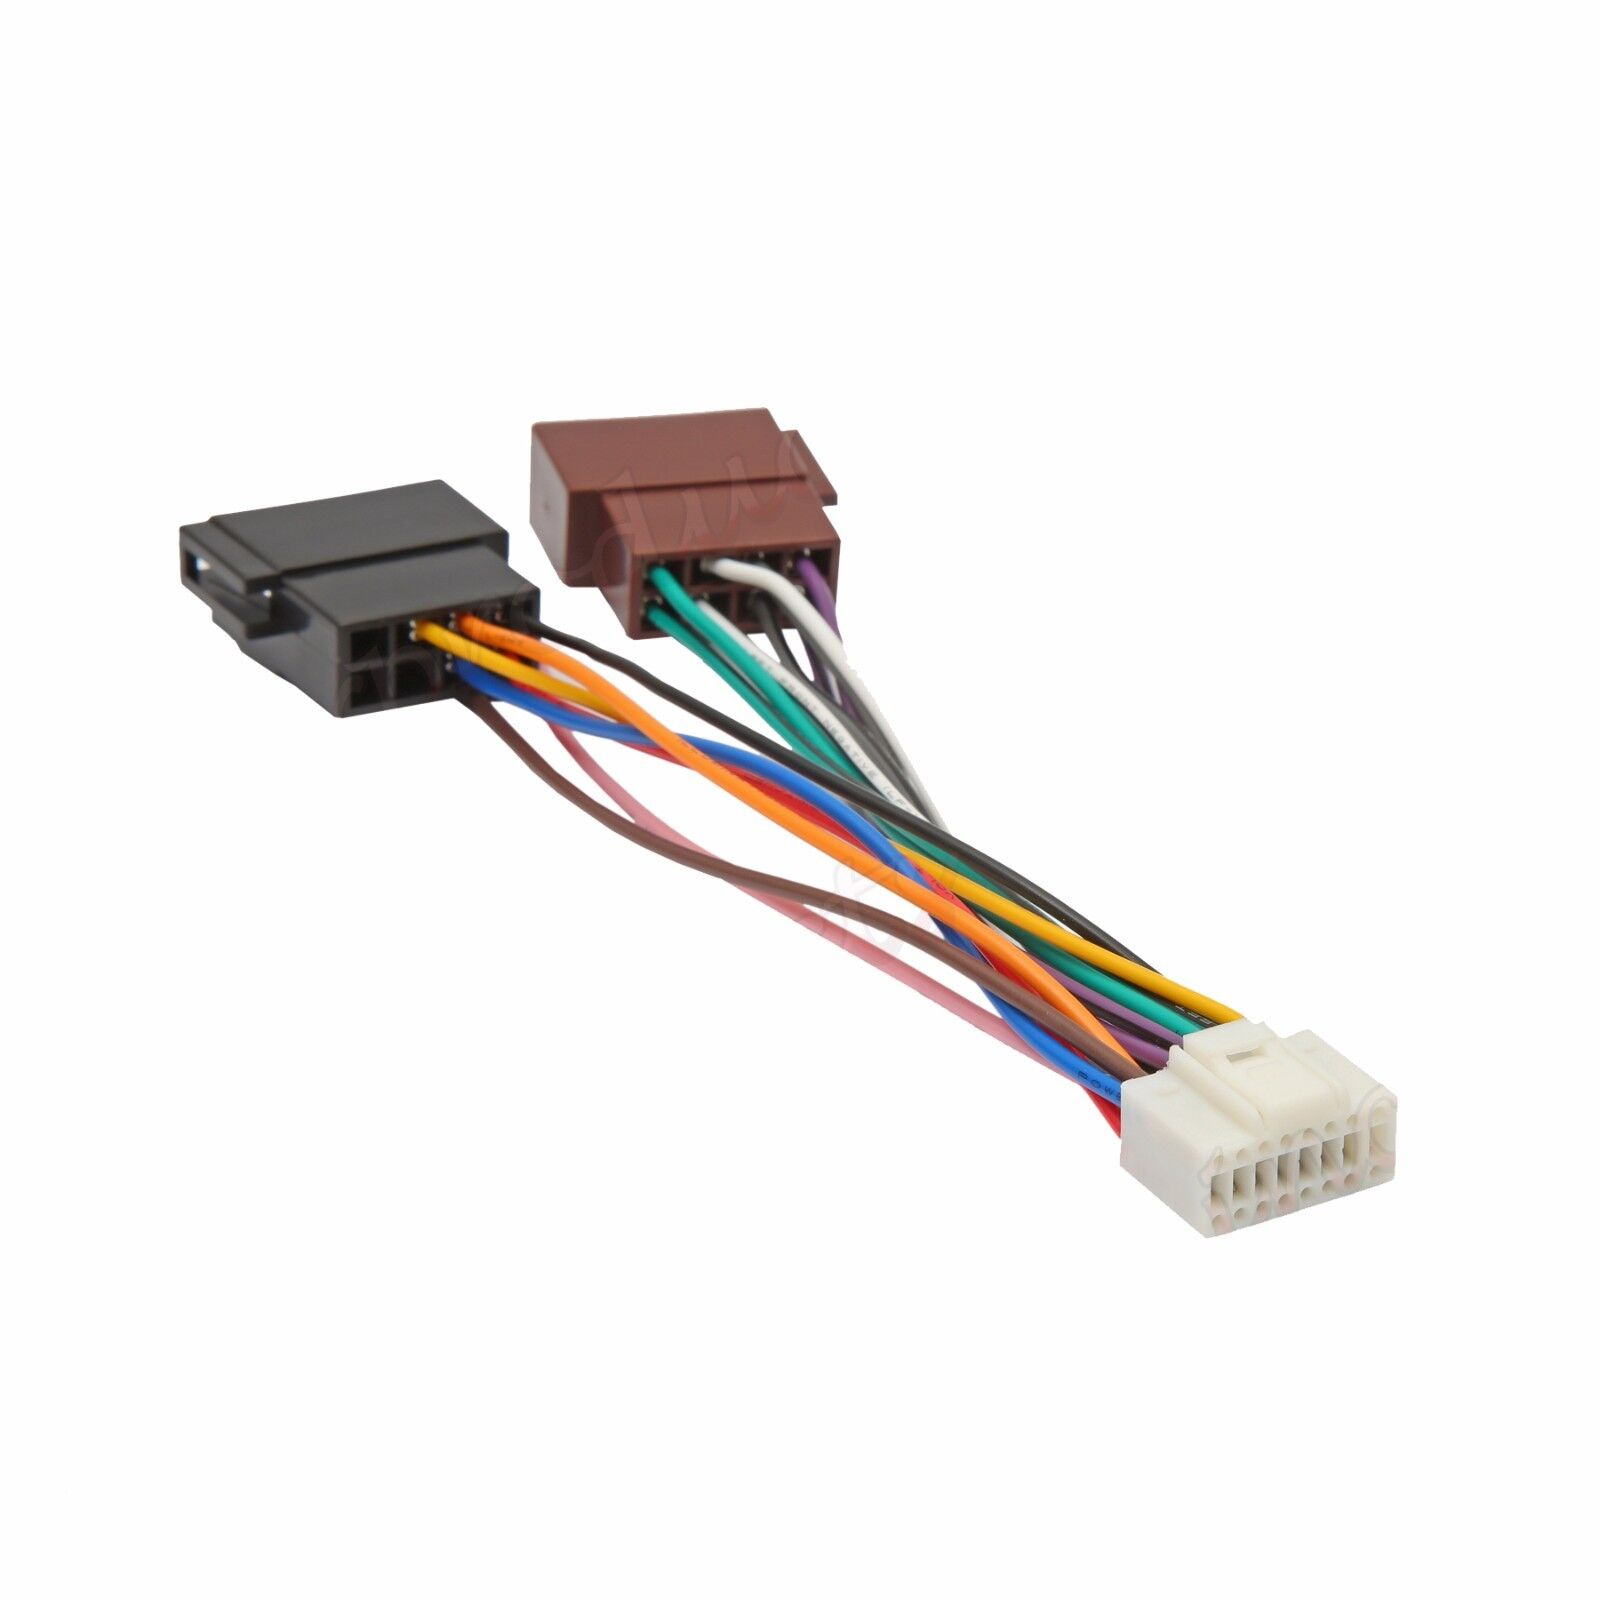 hight resolution of alpine 16 pin iso wiring harness connector adaptor car stereo radio loom